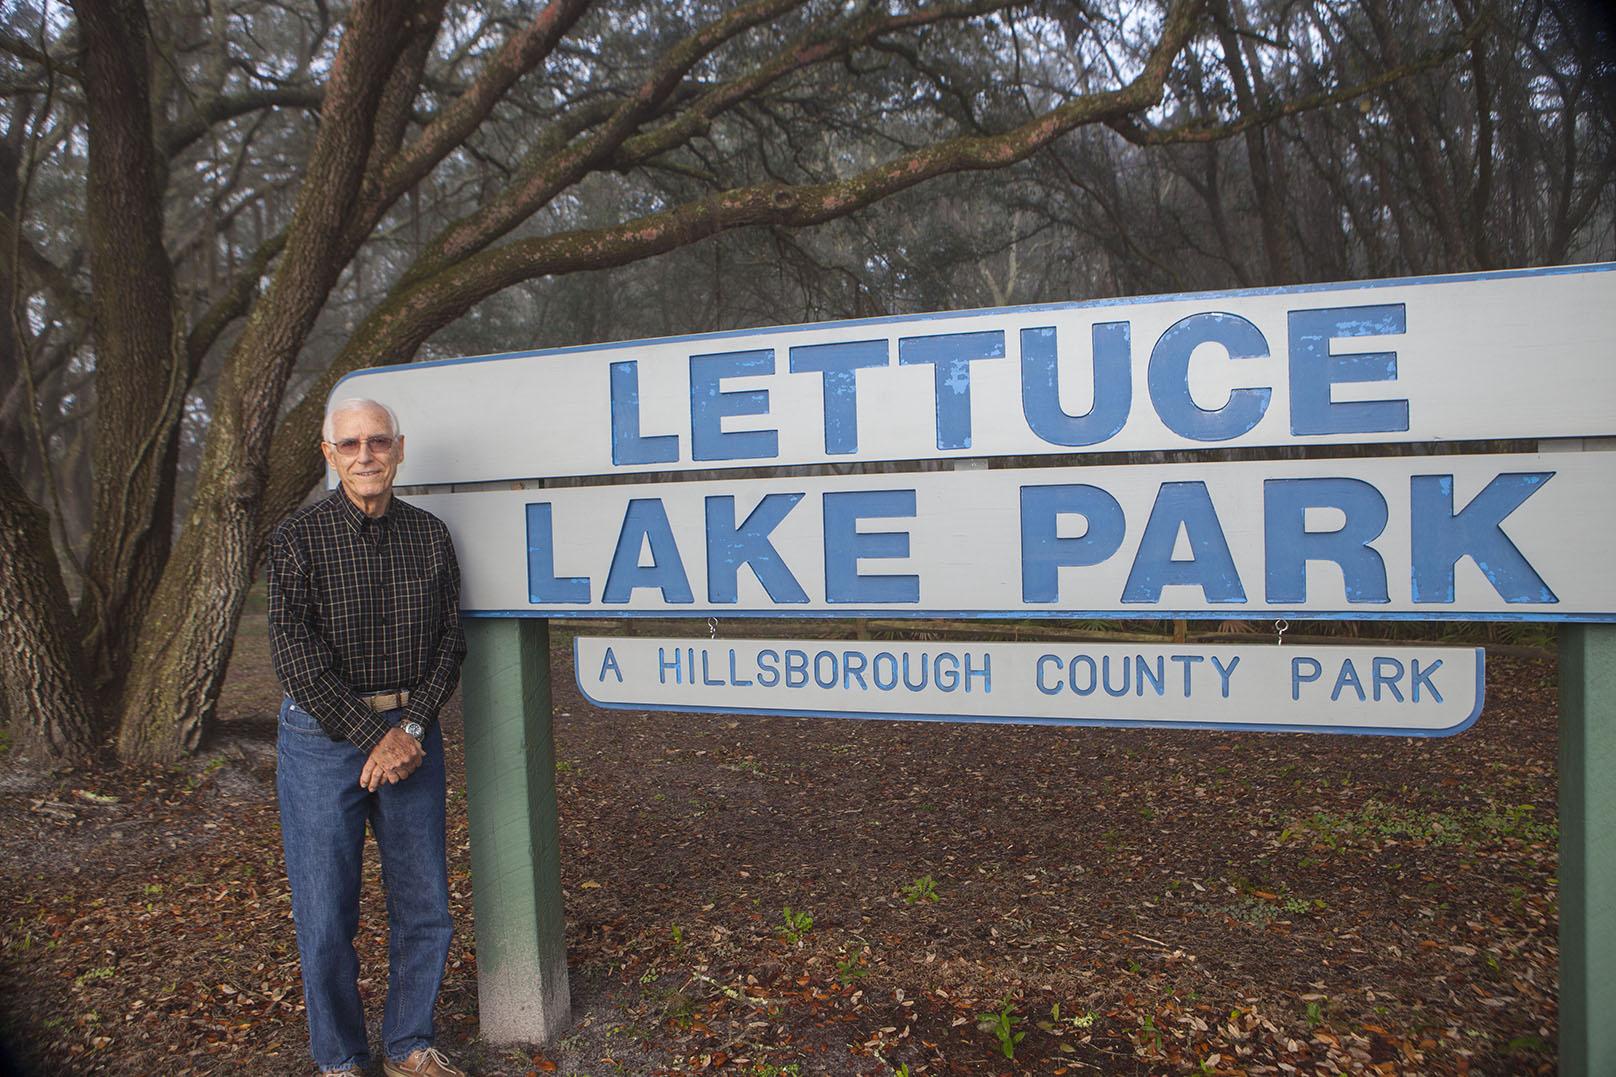 Joel Jackson -- Lettuce Lake